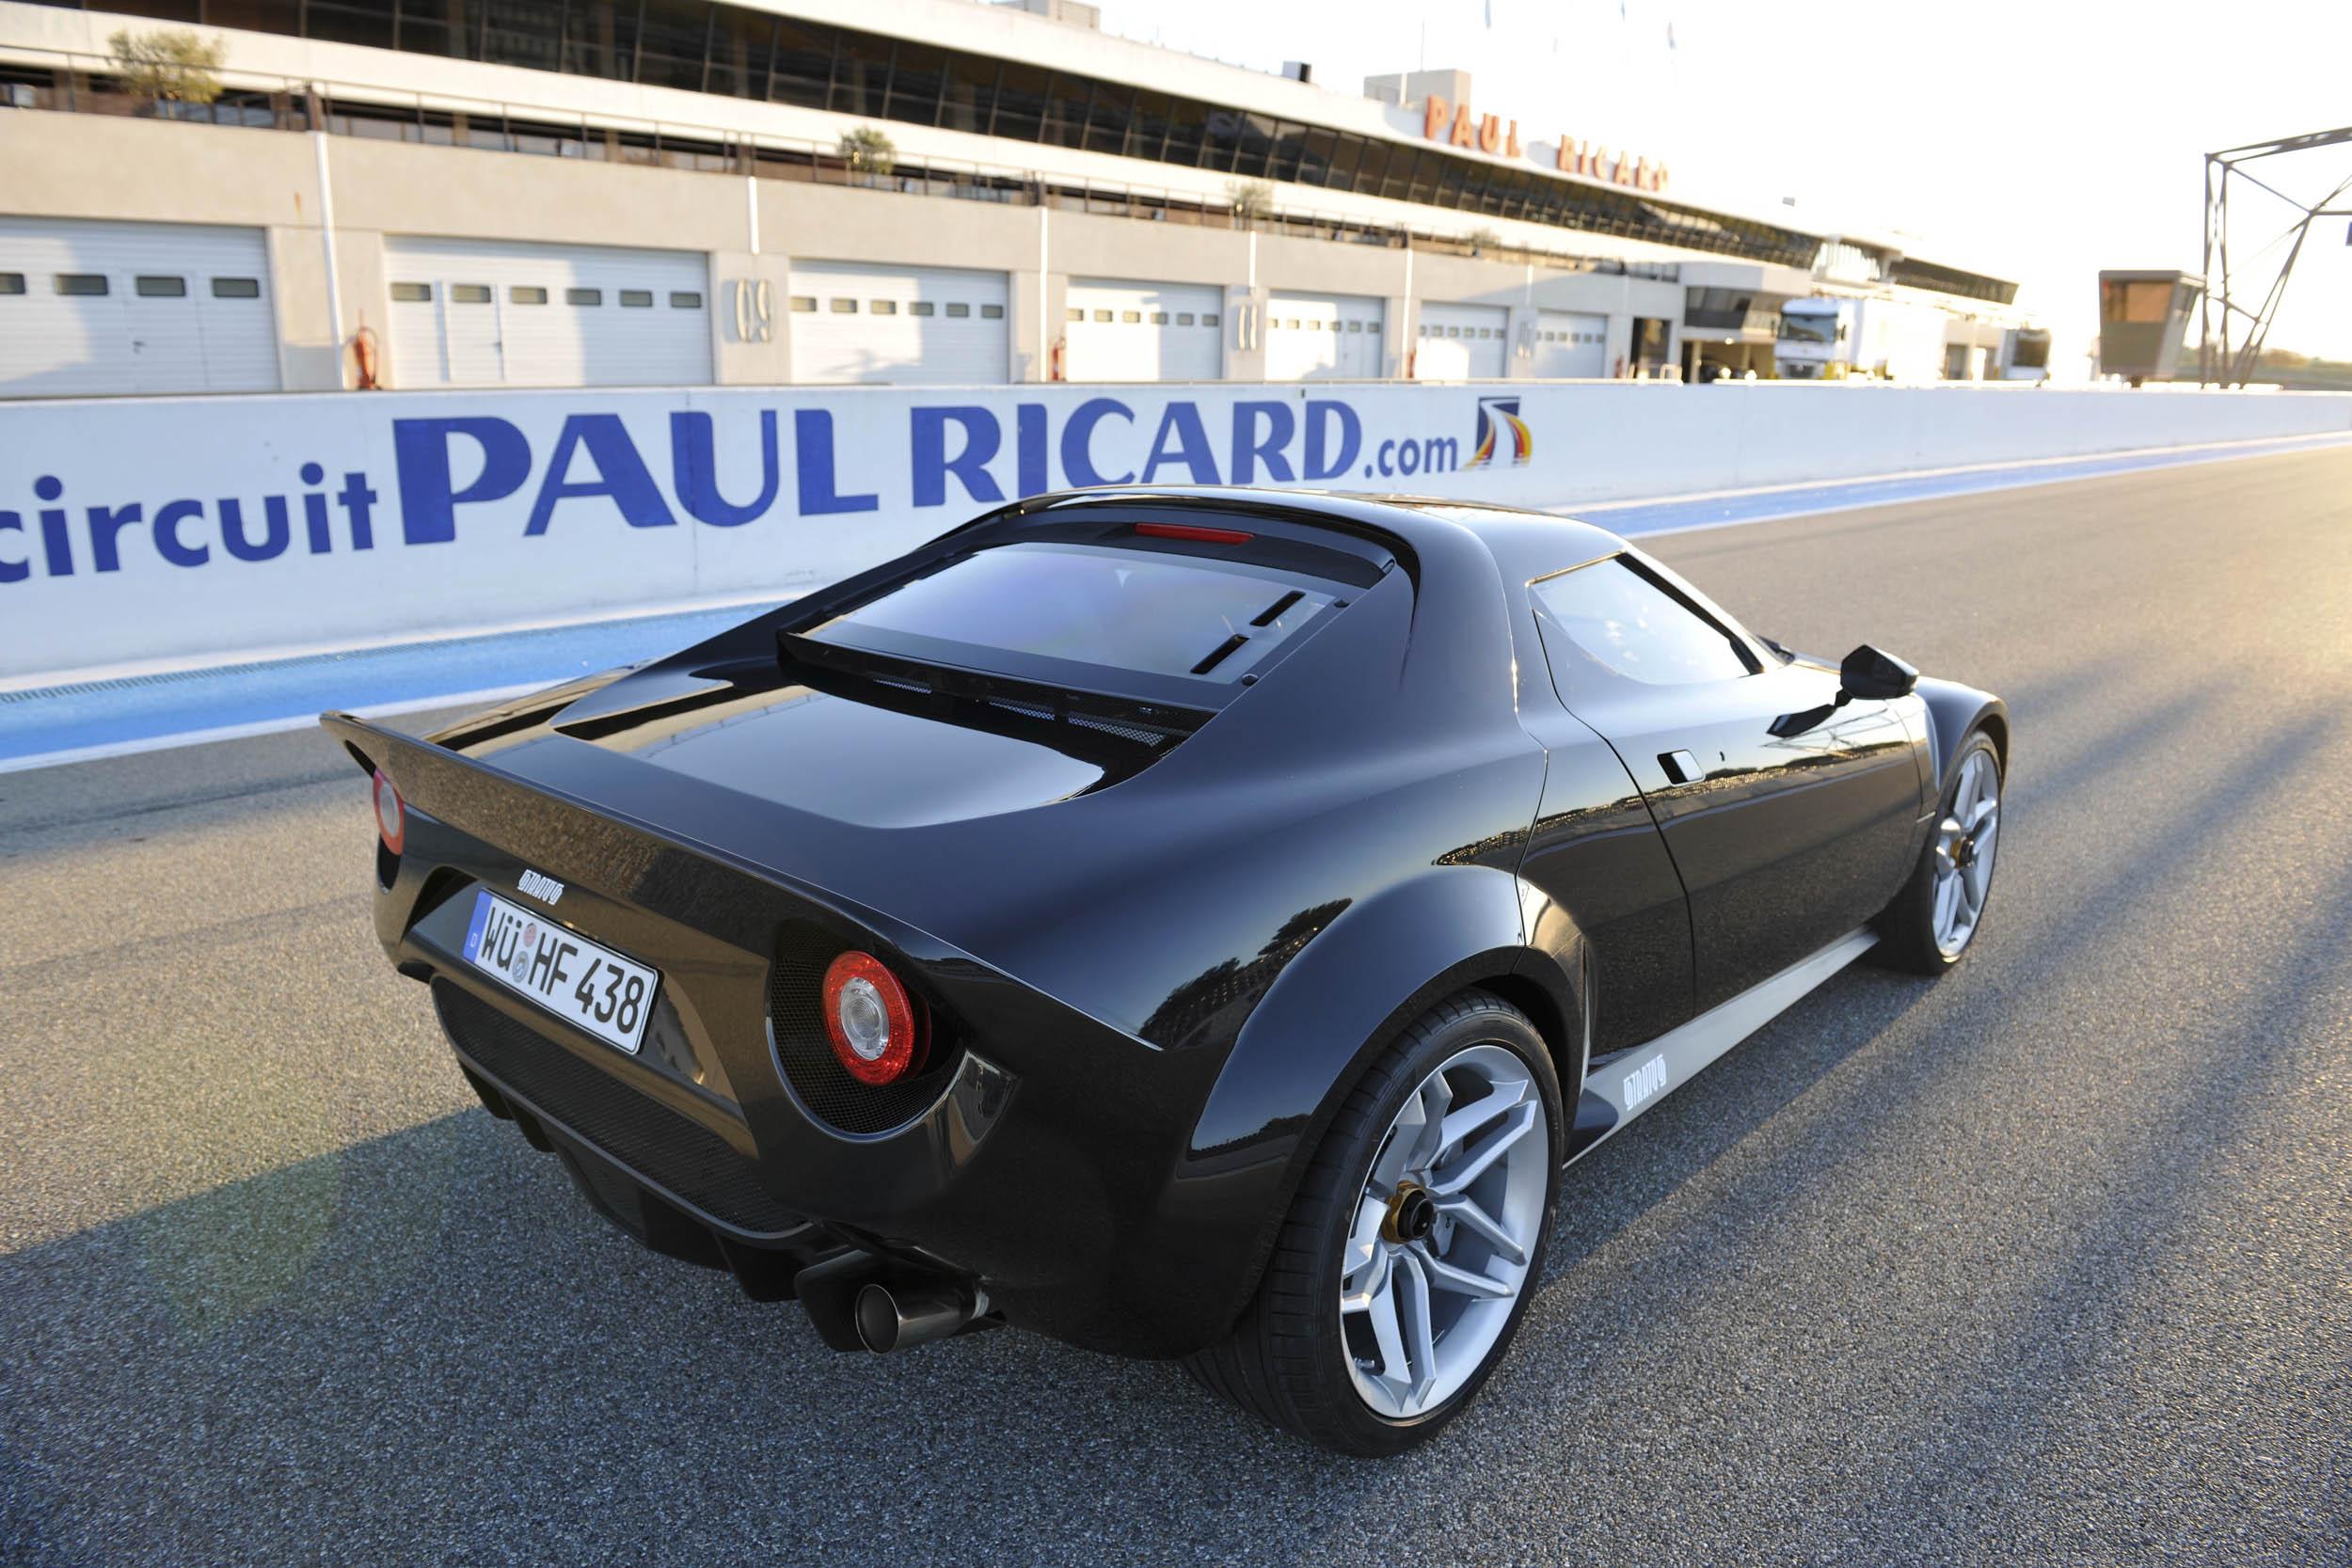 New Stratos rear 3/4